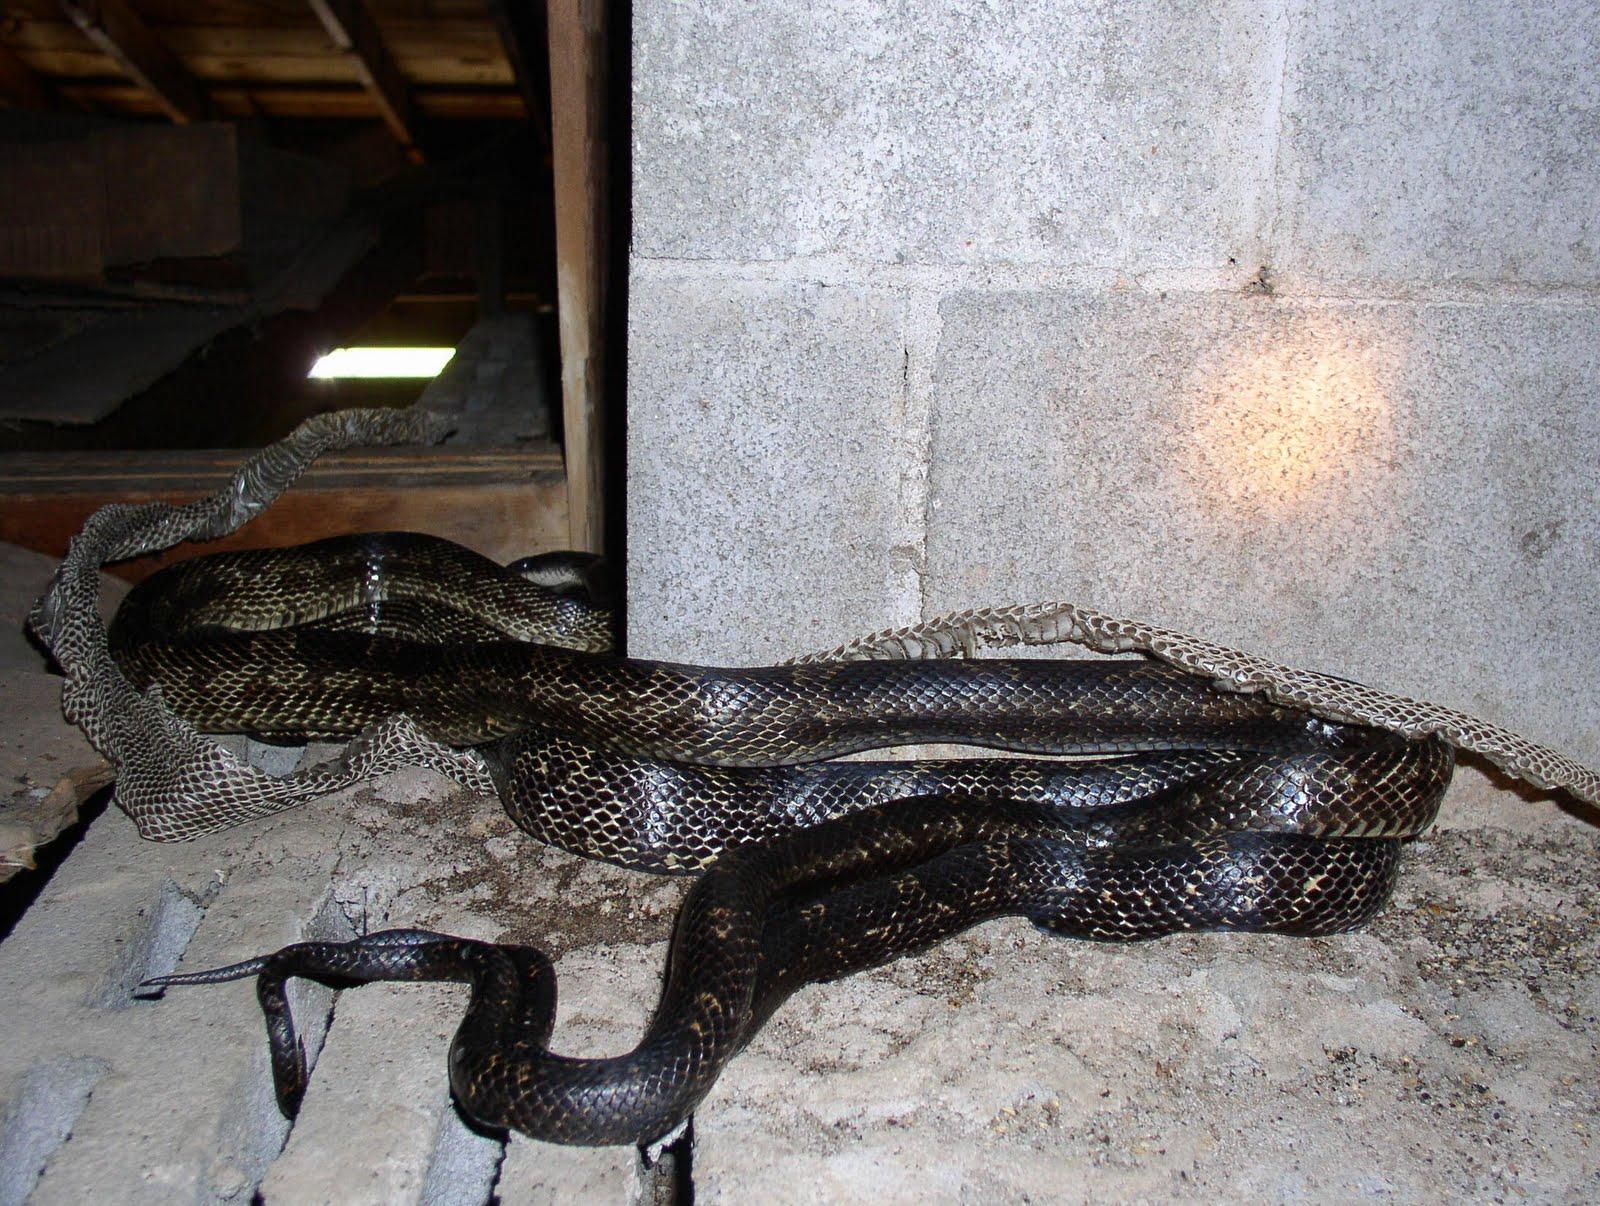 7-23 Mating Black Snakes 6-6-06 (2)